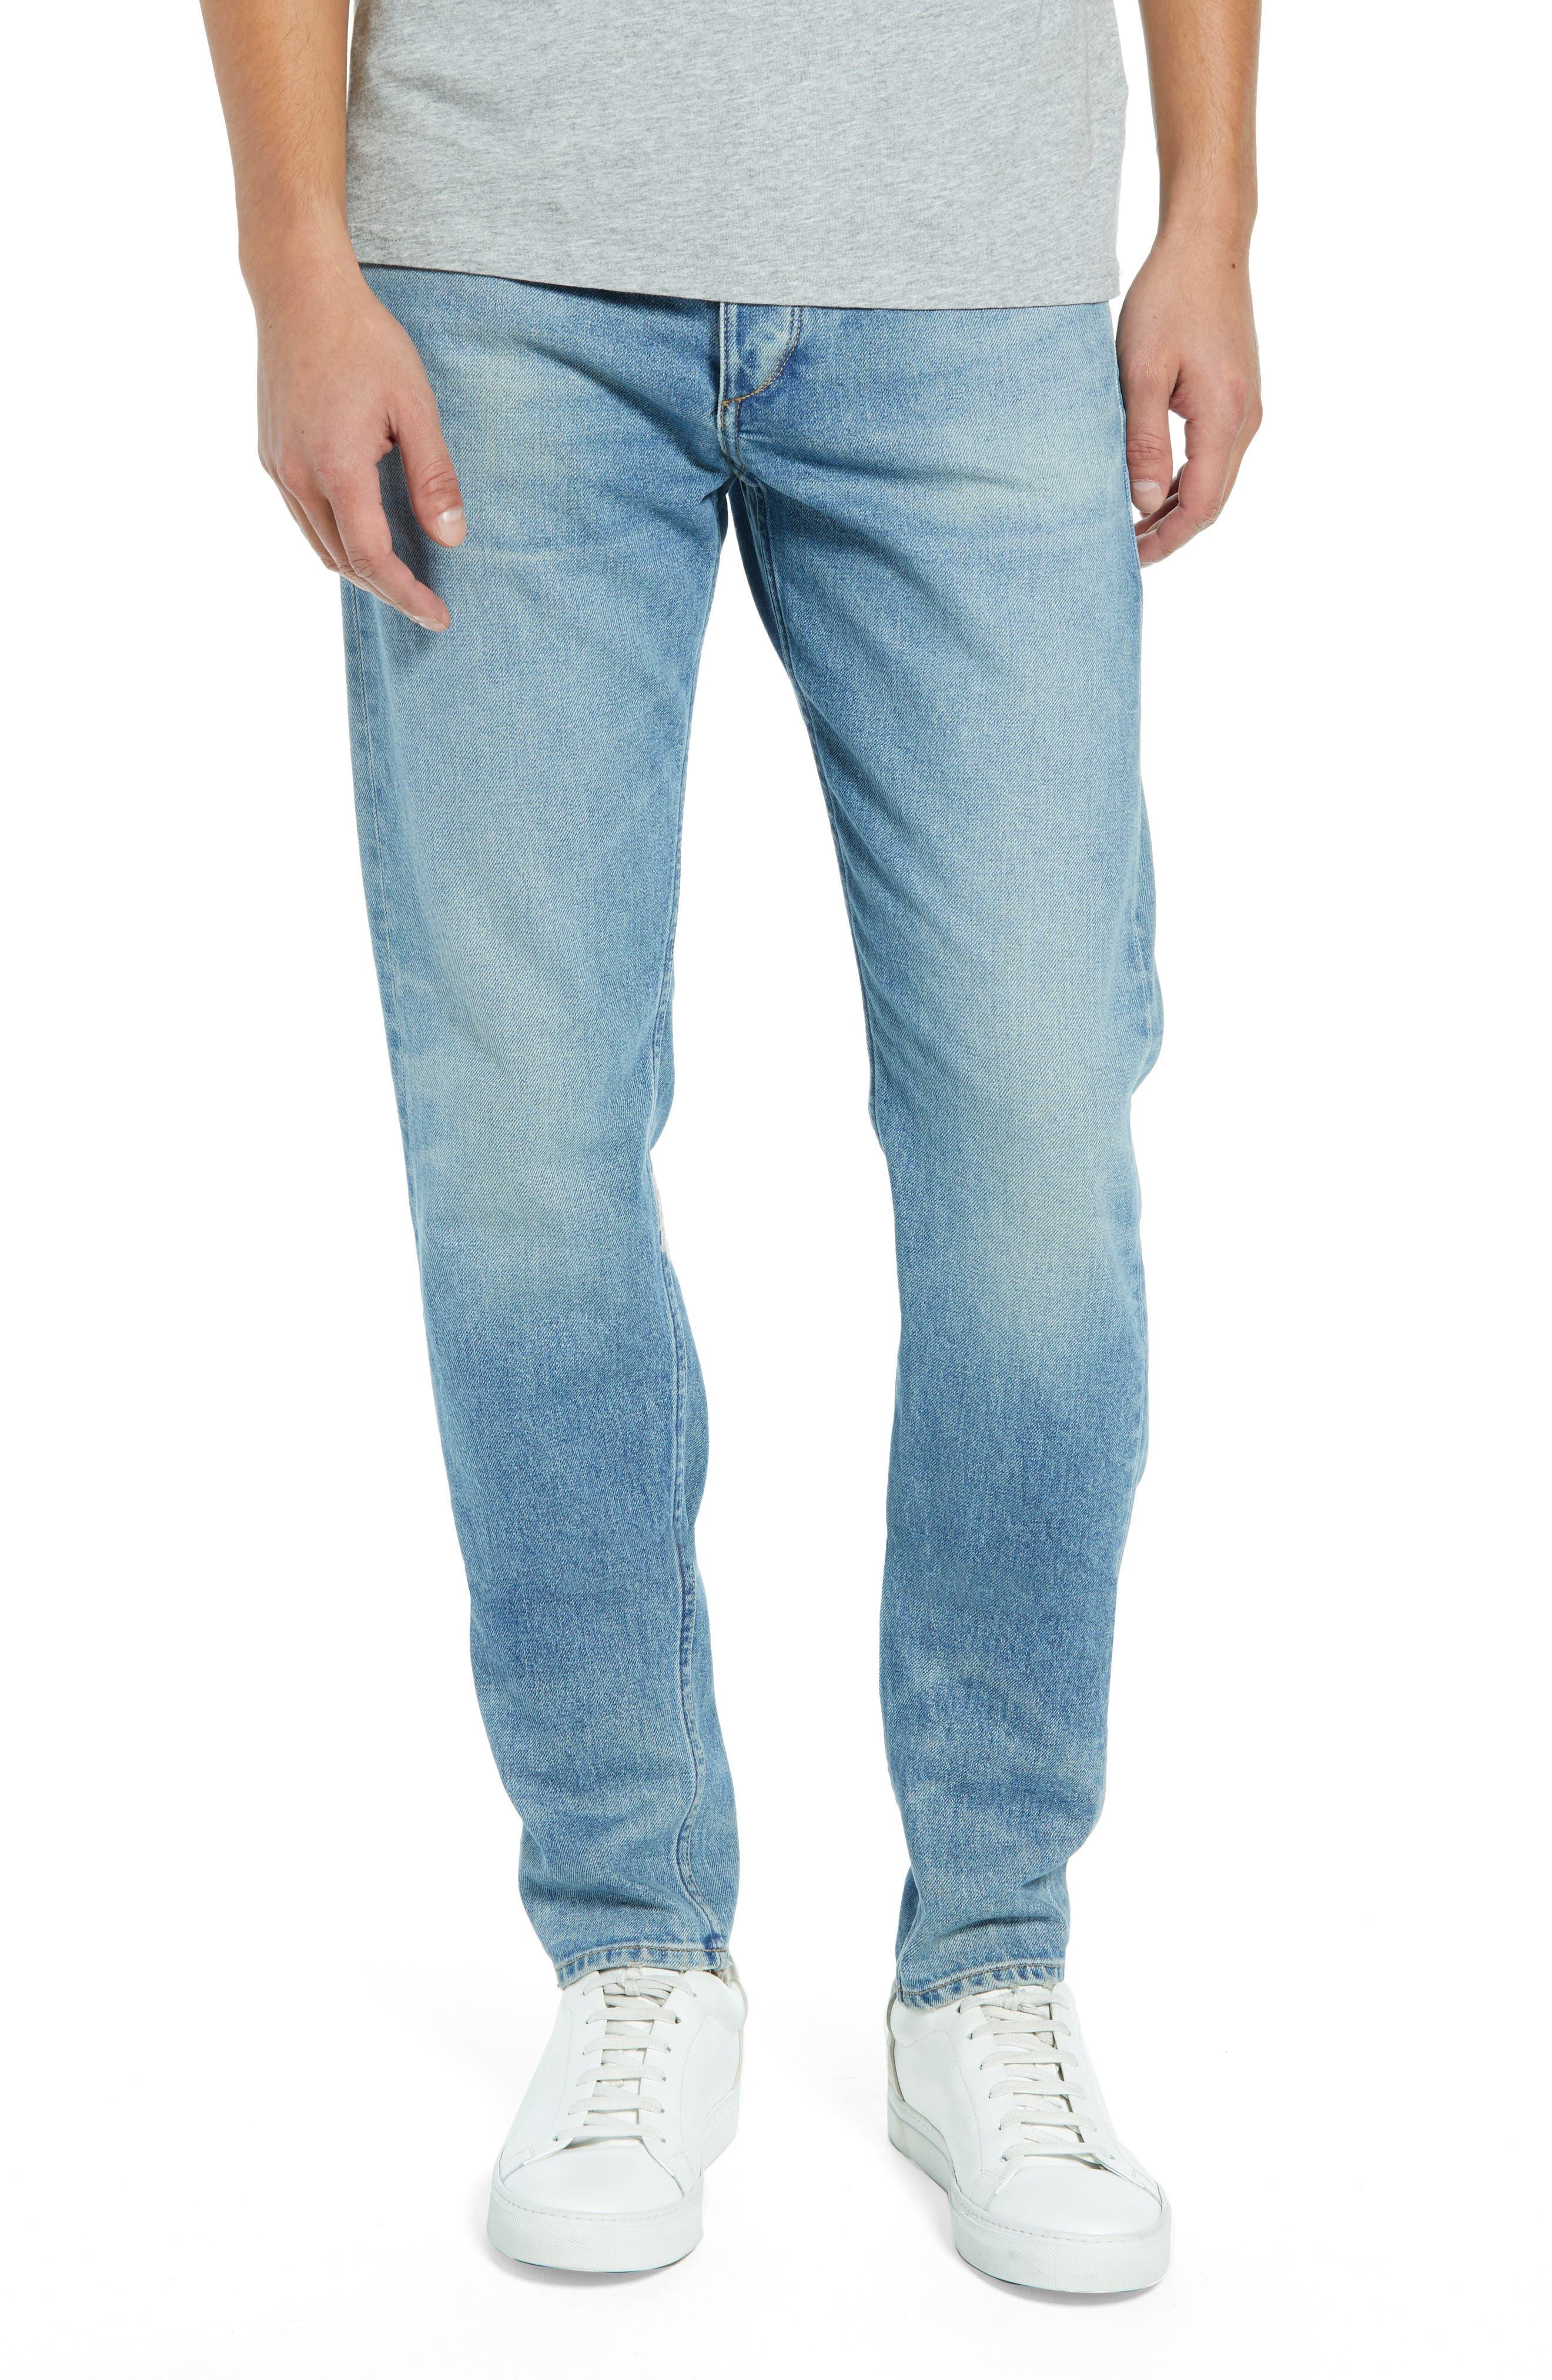 Fit 1 Skinny Fit Jeans,                         Main,                         color, JAMIE